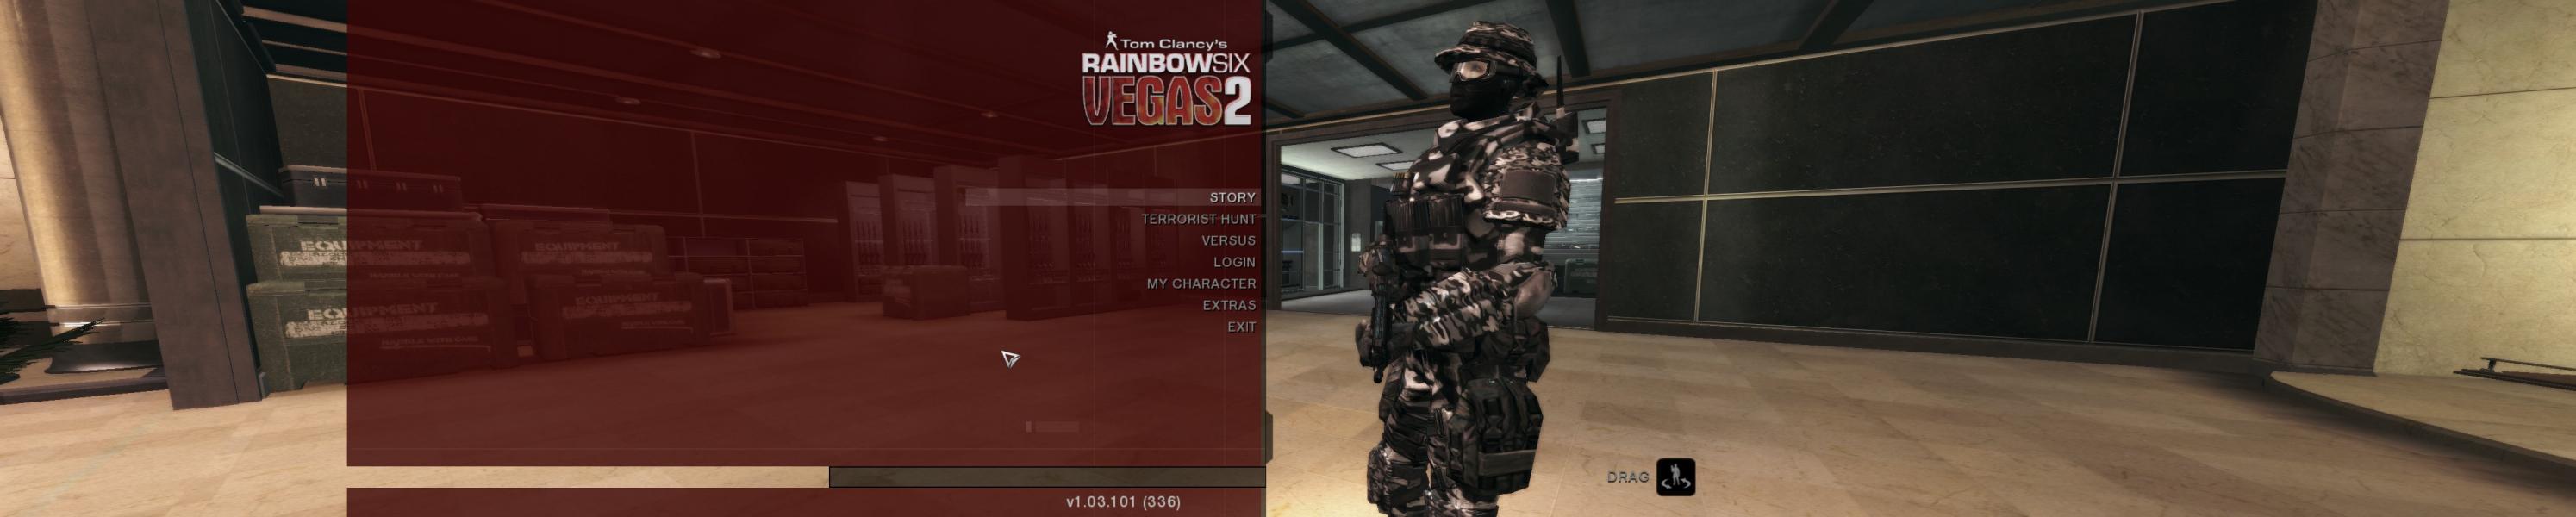 rainbow six: vegas 2 | wsgf